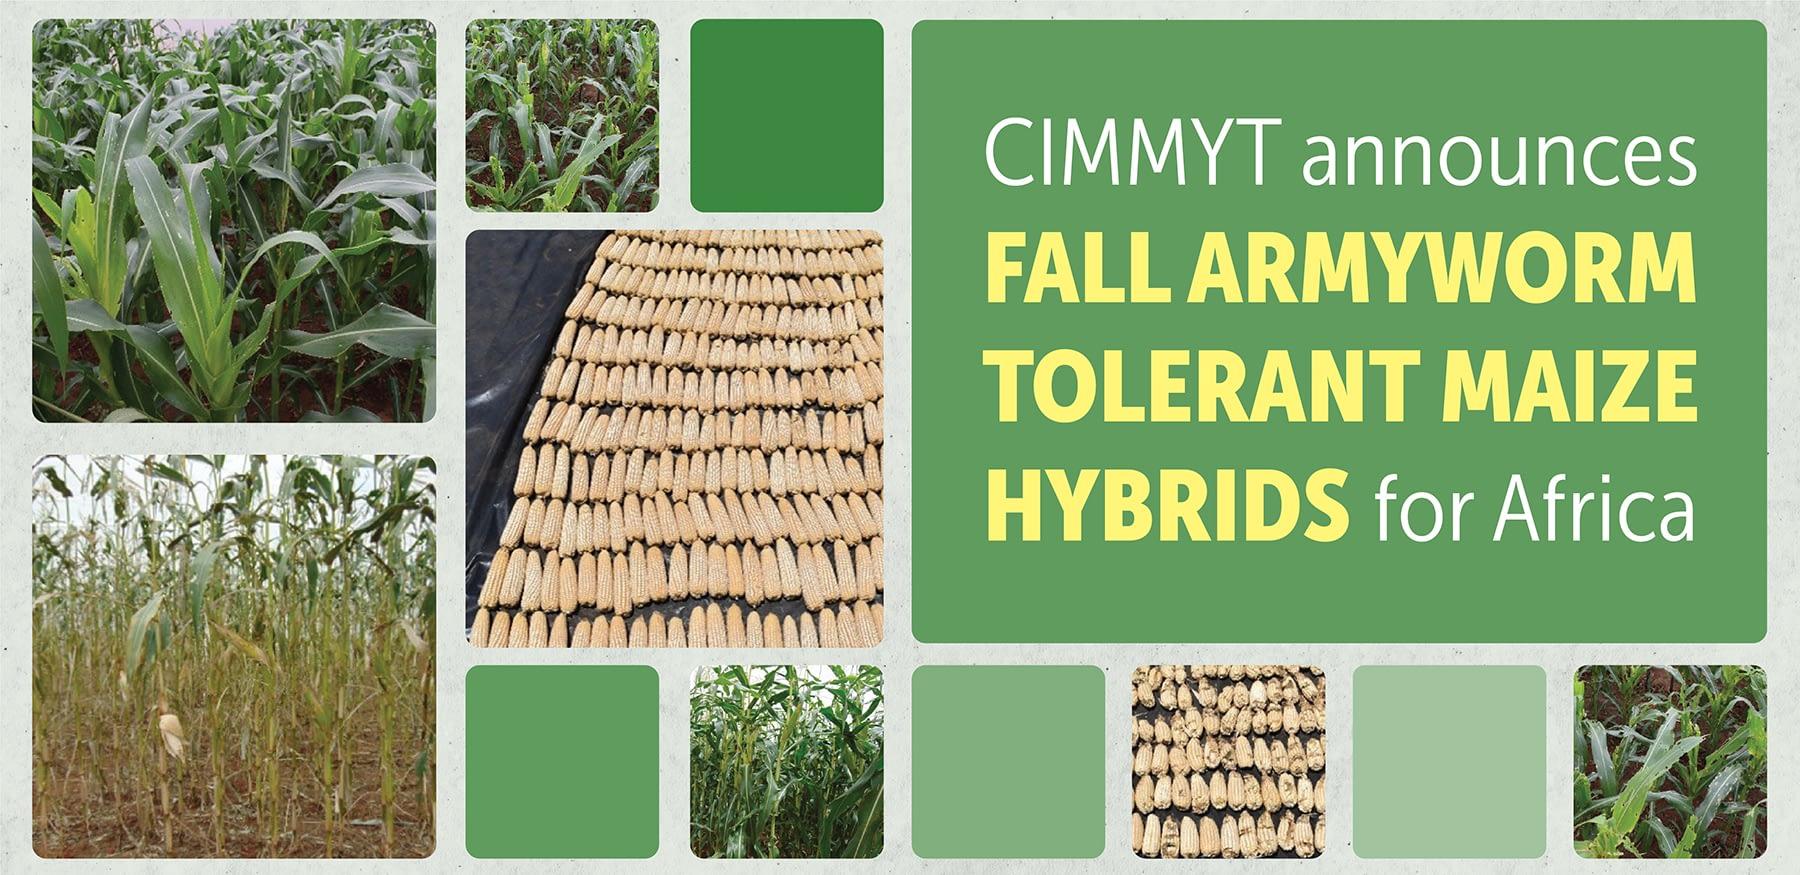 CIMMYT announced fall armyworm-tolerant maize hybrids for Africa.